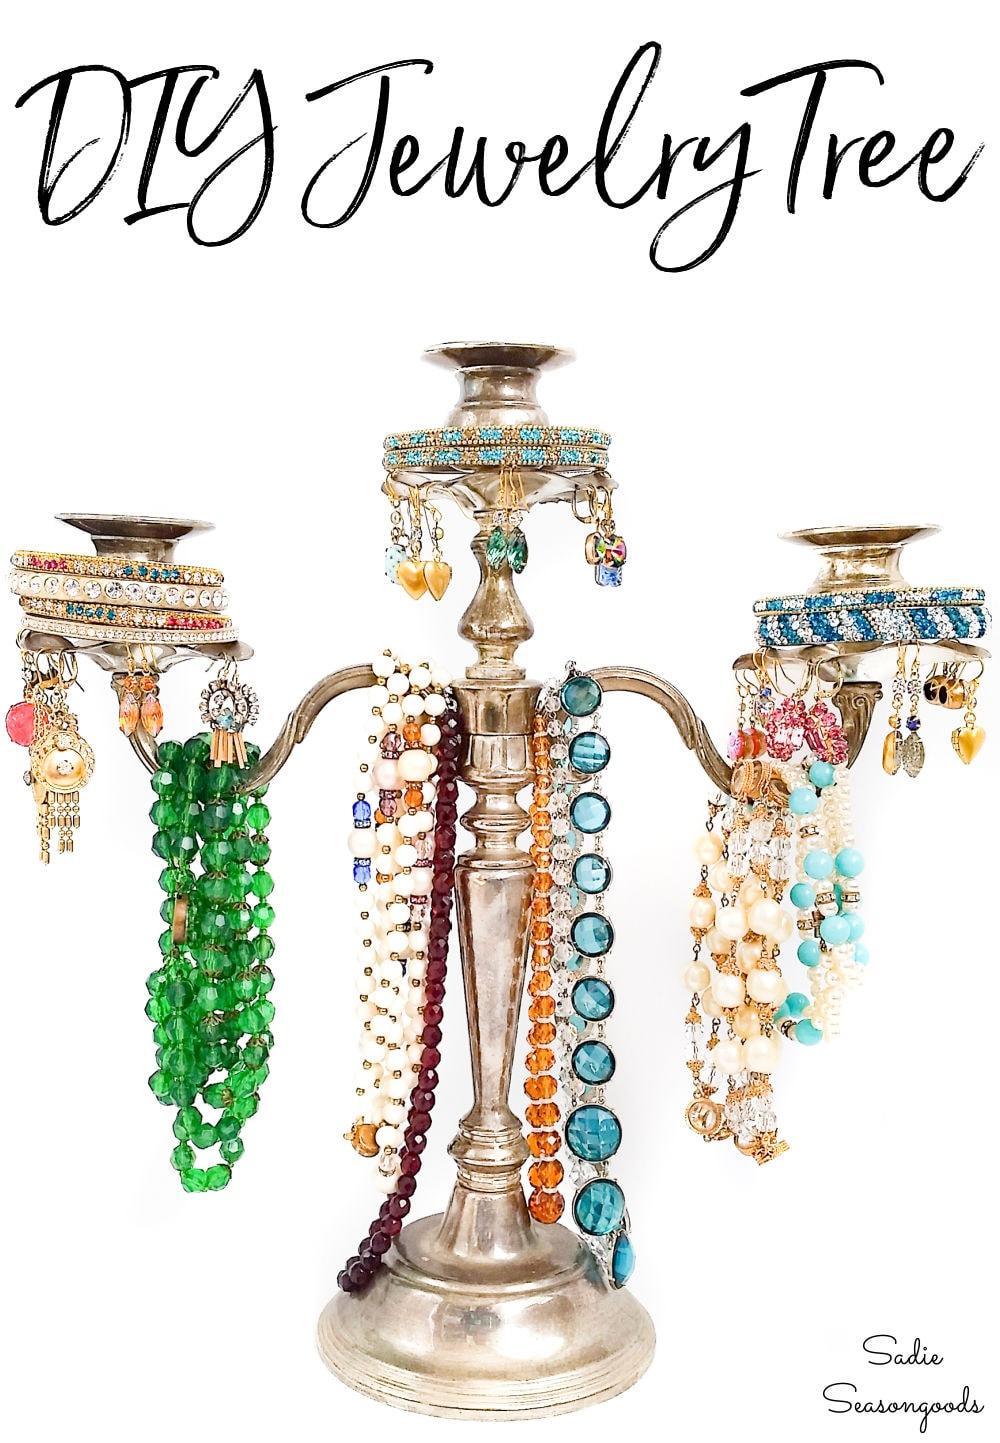 jewelry tree organizer from a silver candelabra